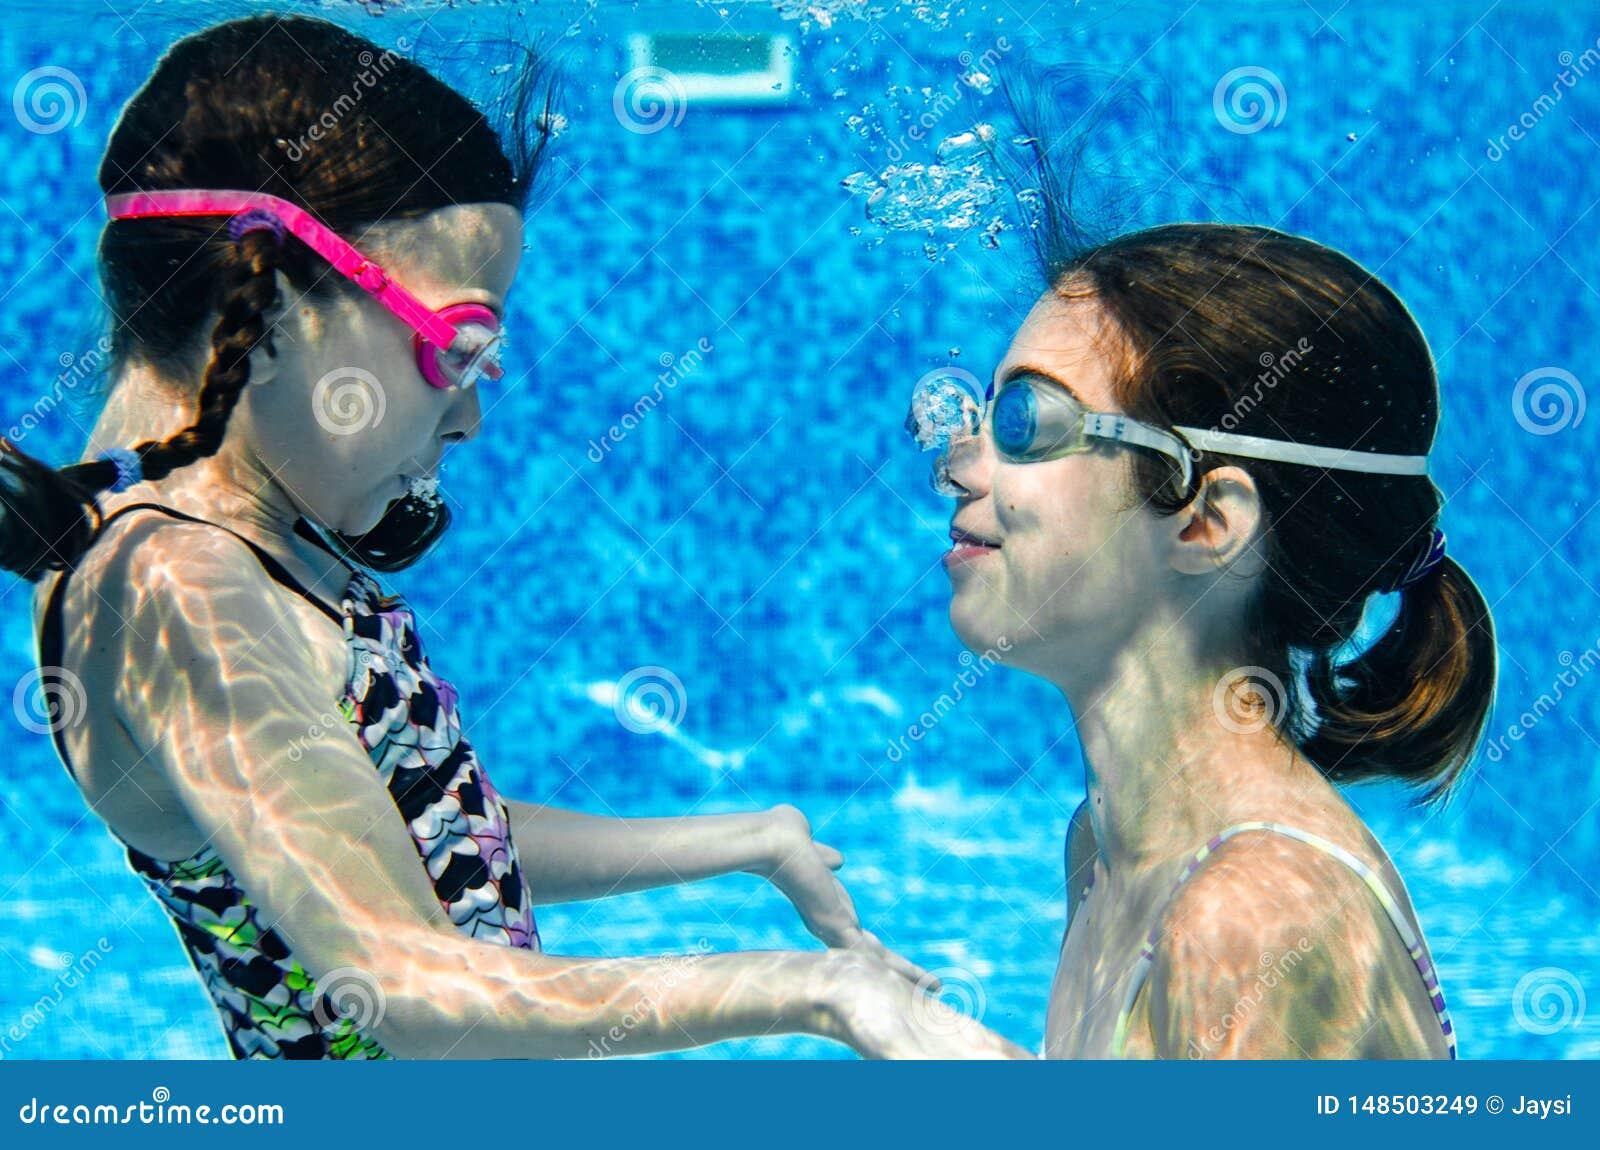 Children swim in swimming pool underwater, happy active girls have fun under water, kids fitness and sport